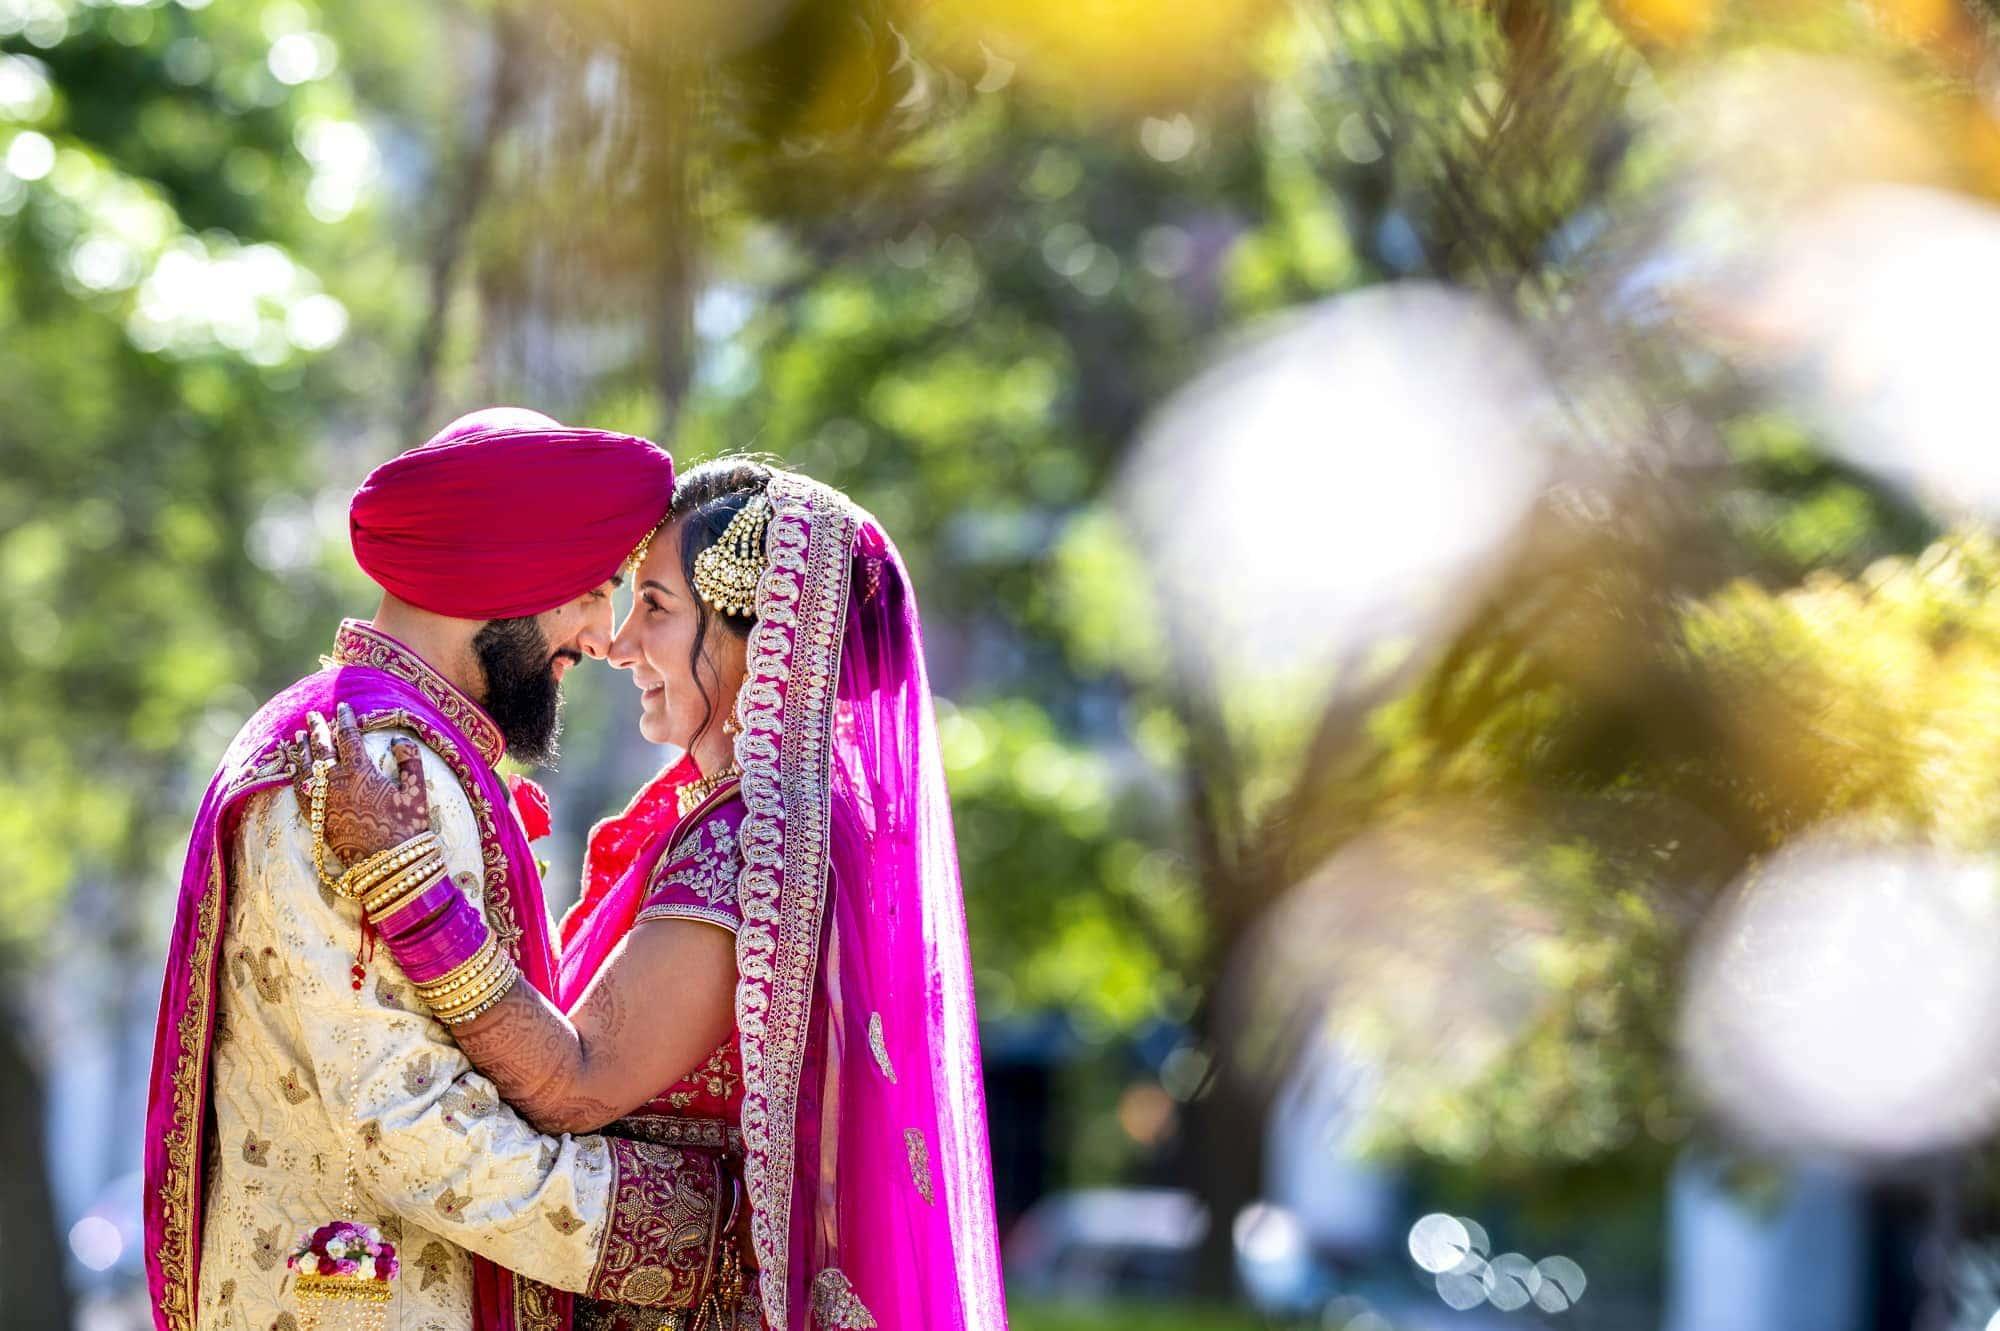 manny-gurdeep-wedding-blog2-1